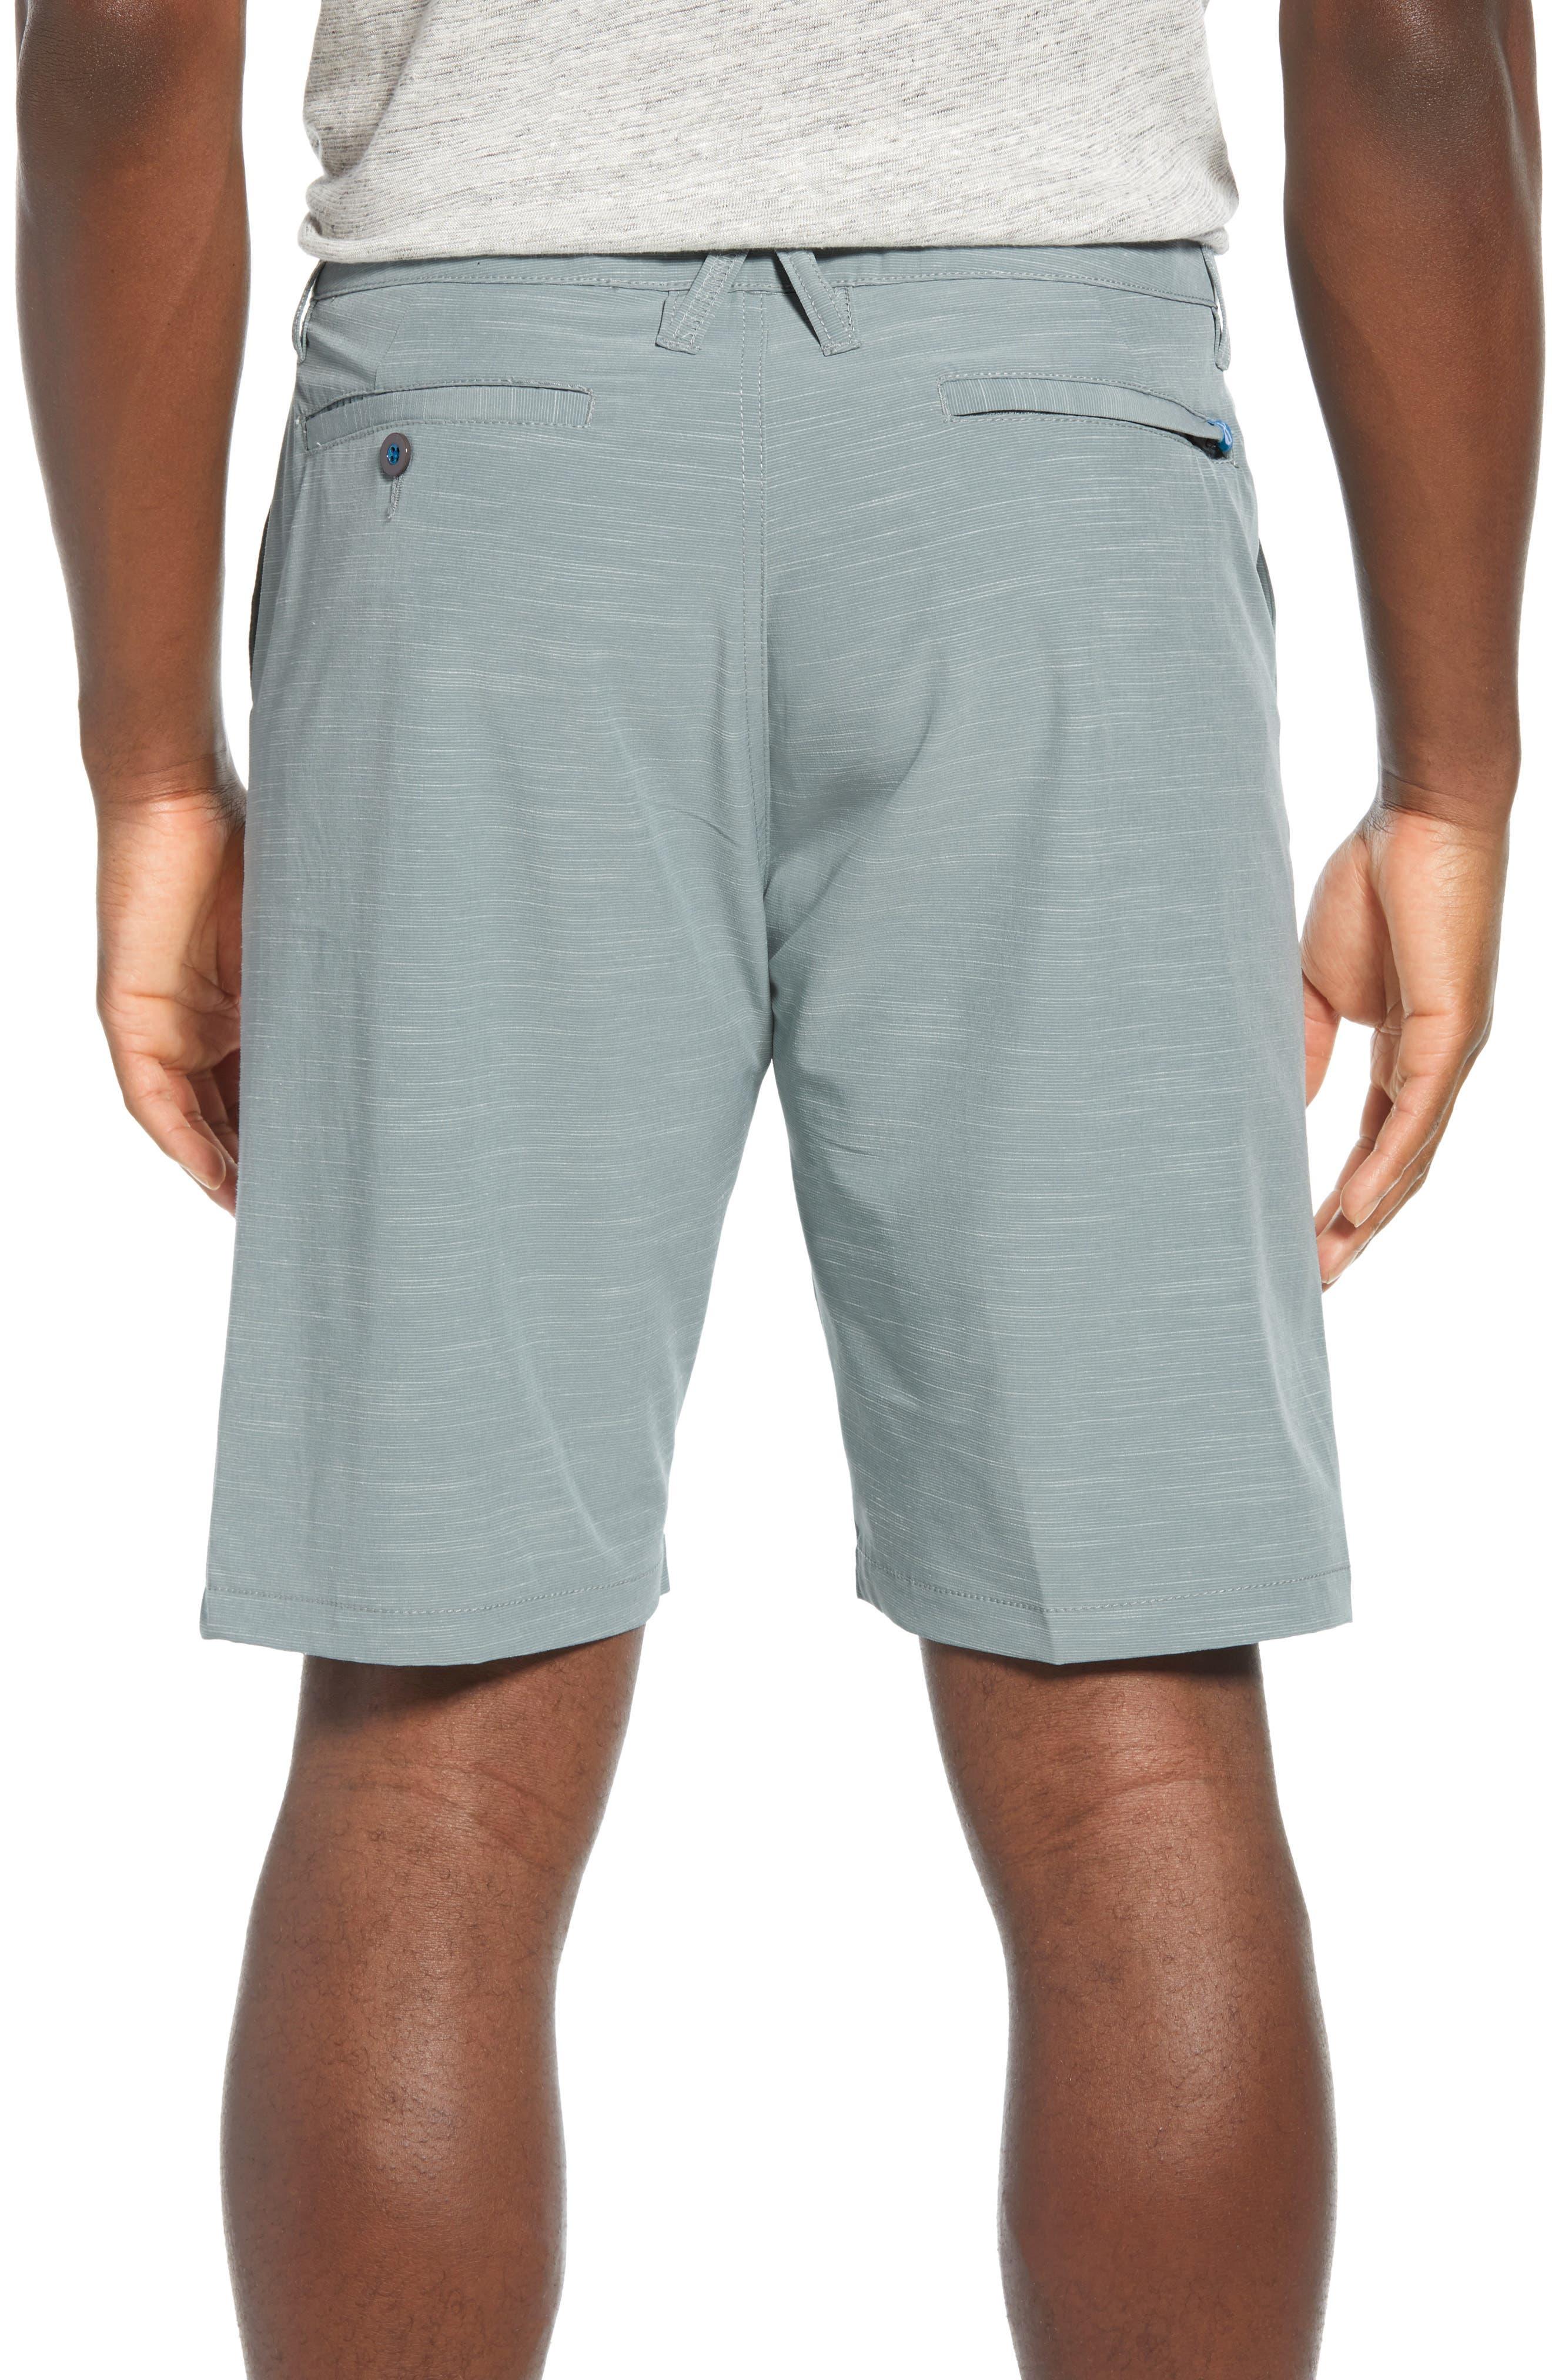 DEVEREUX, Cruiser Hybrid Shorts, Alternate thumbnail 2, color, SMOKE GREEN